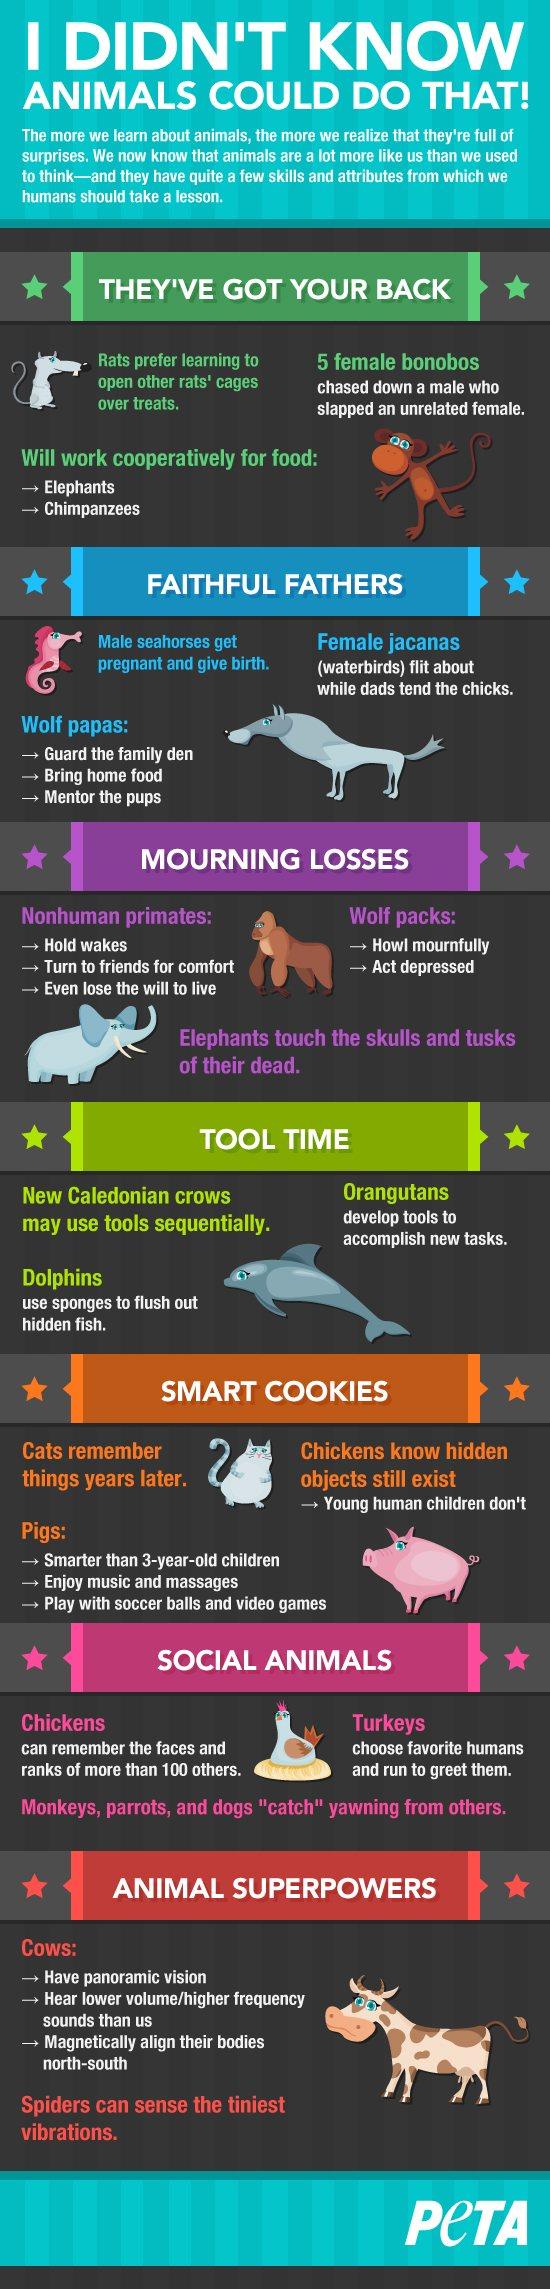 skunk amazing facts